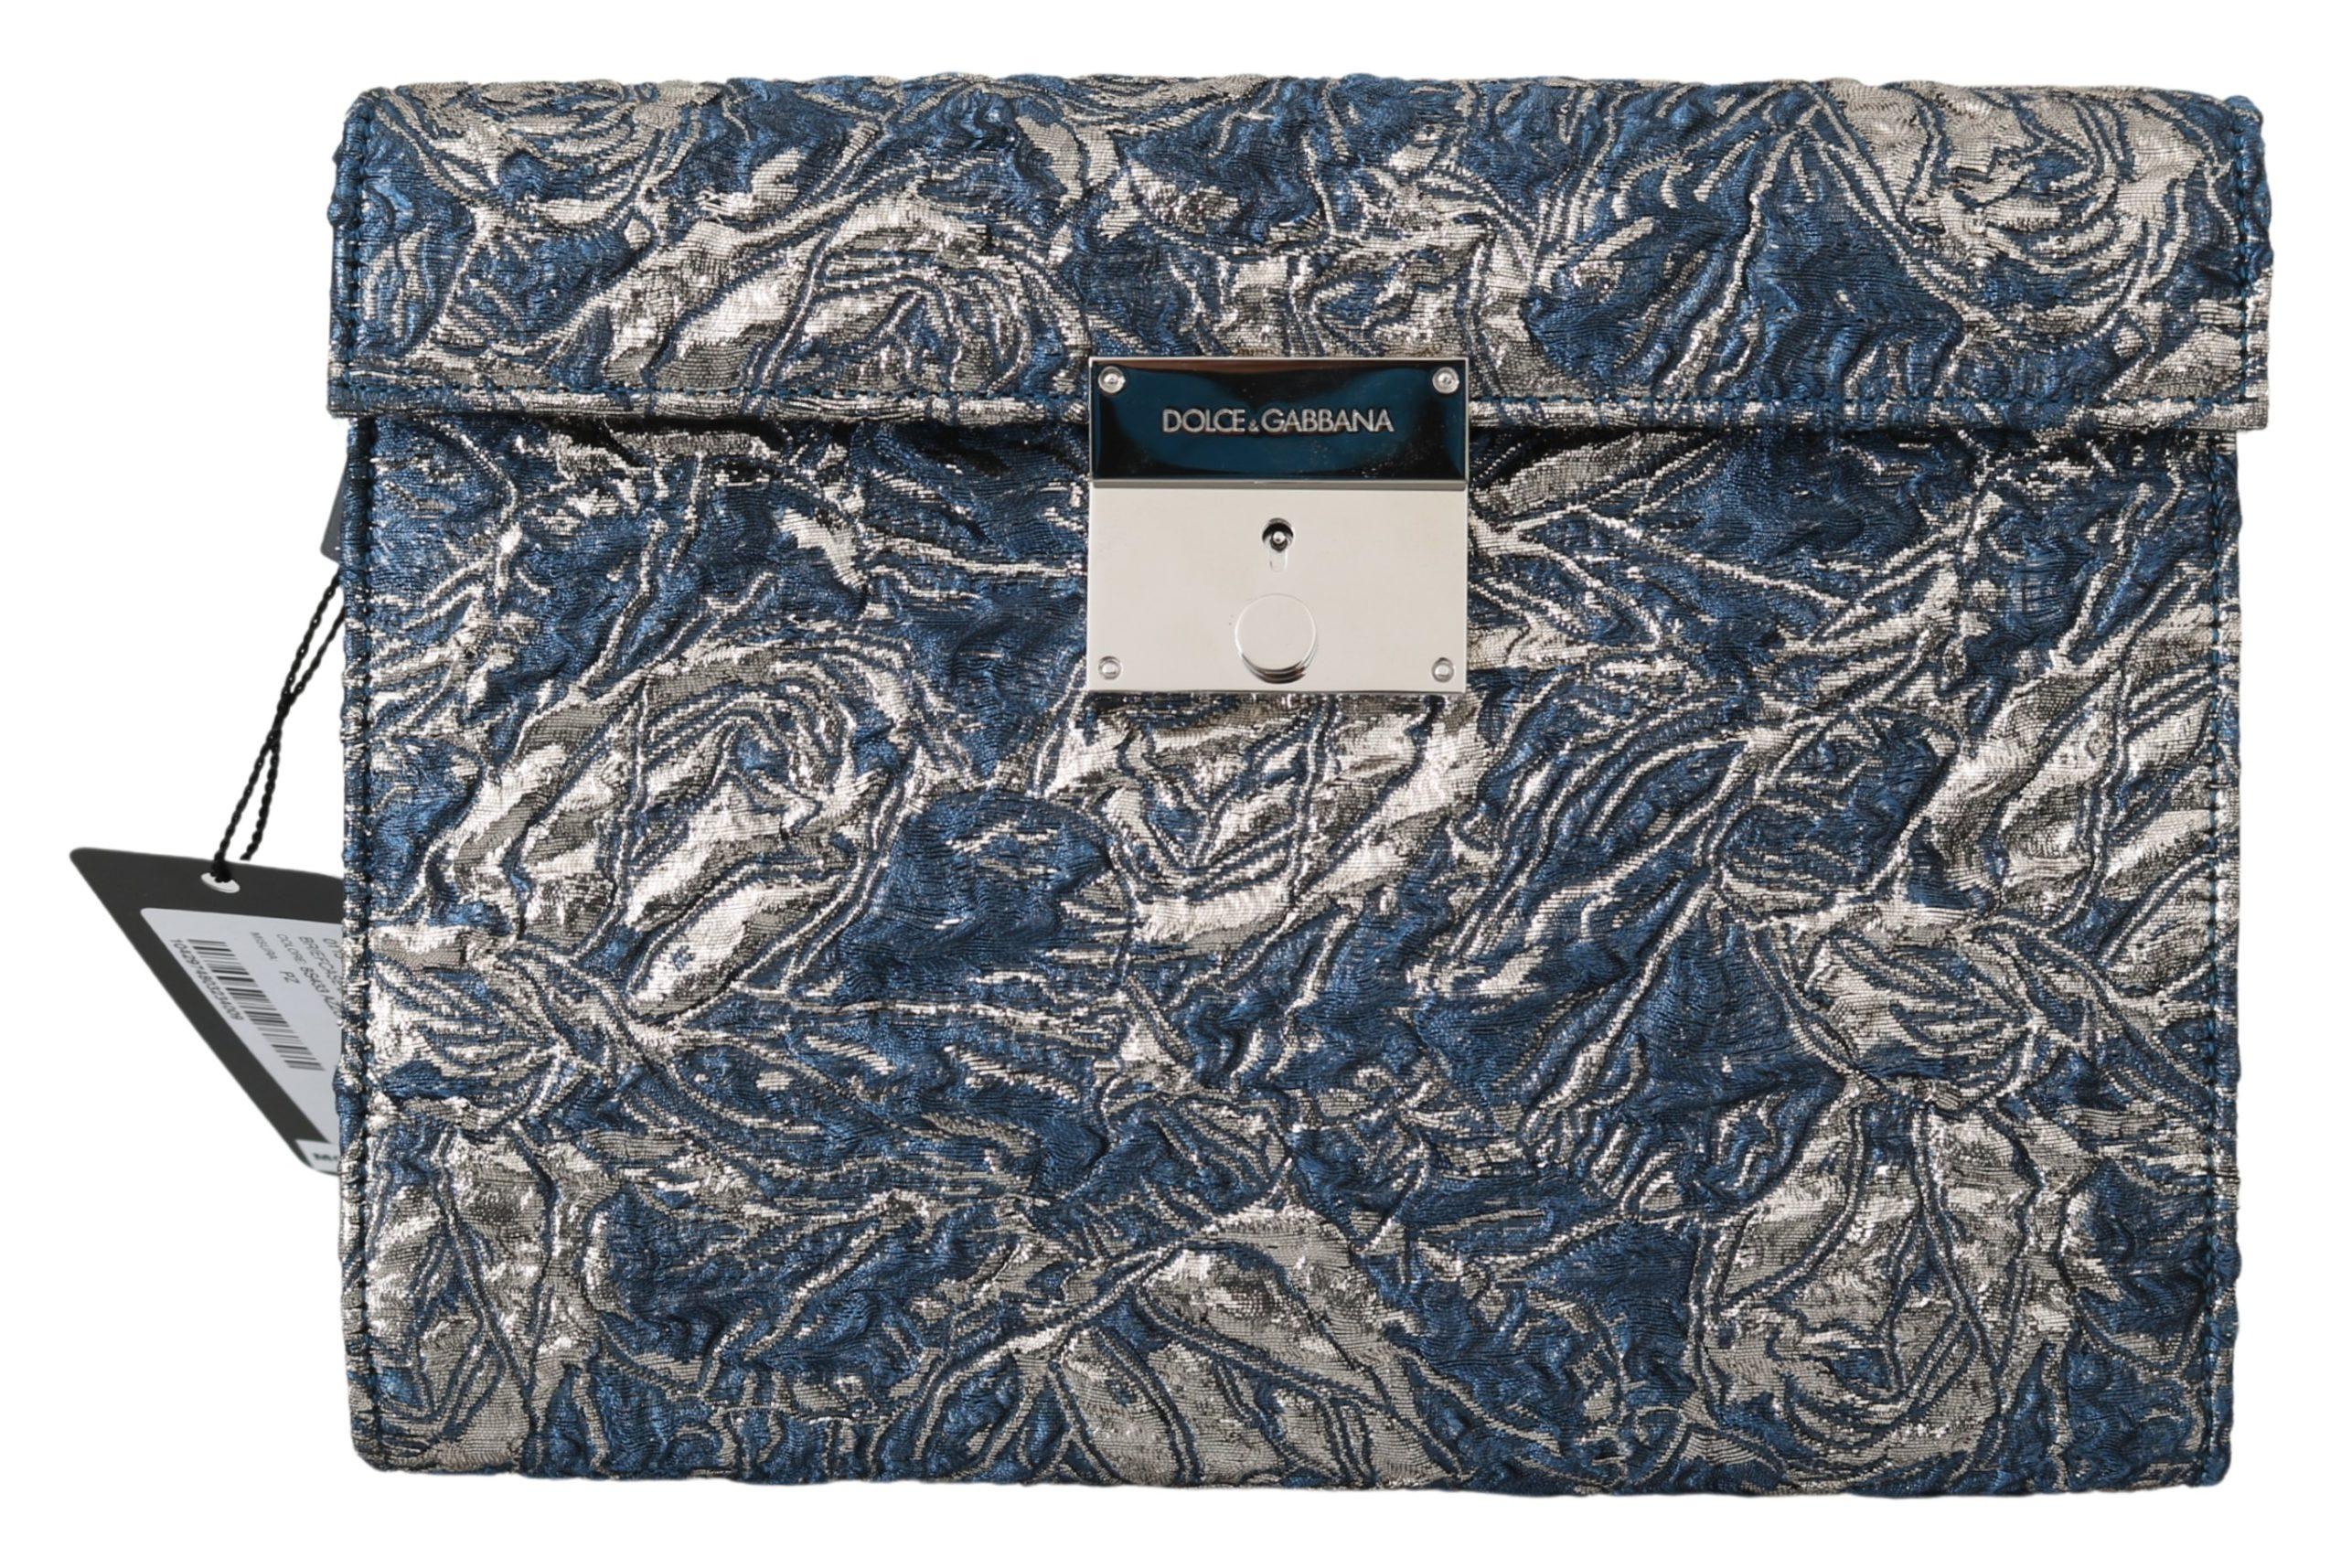 Dolce & Gabbana Men's Jacquard Leather Briefcase Bag Blue VAS9867